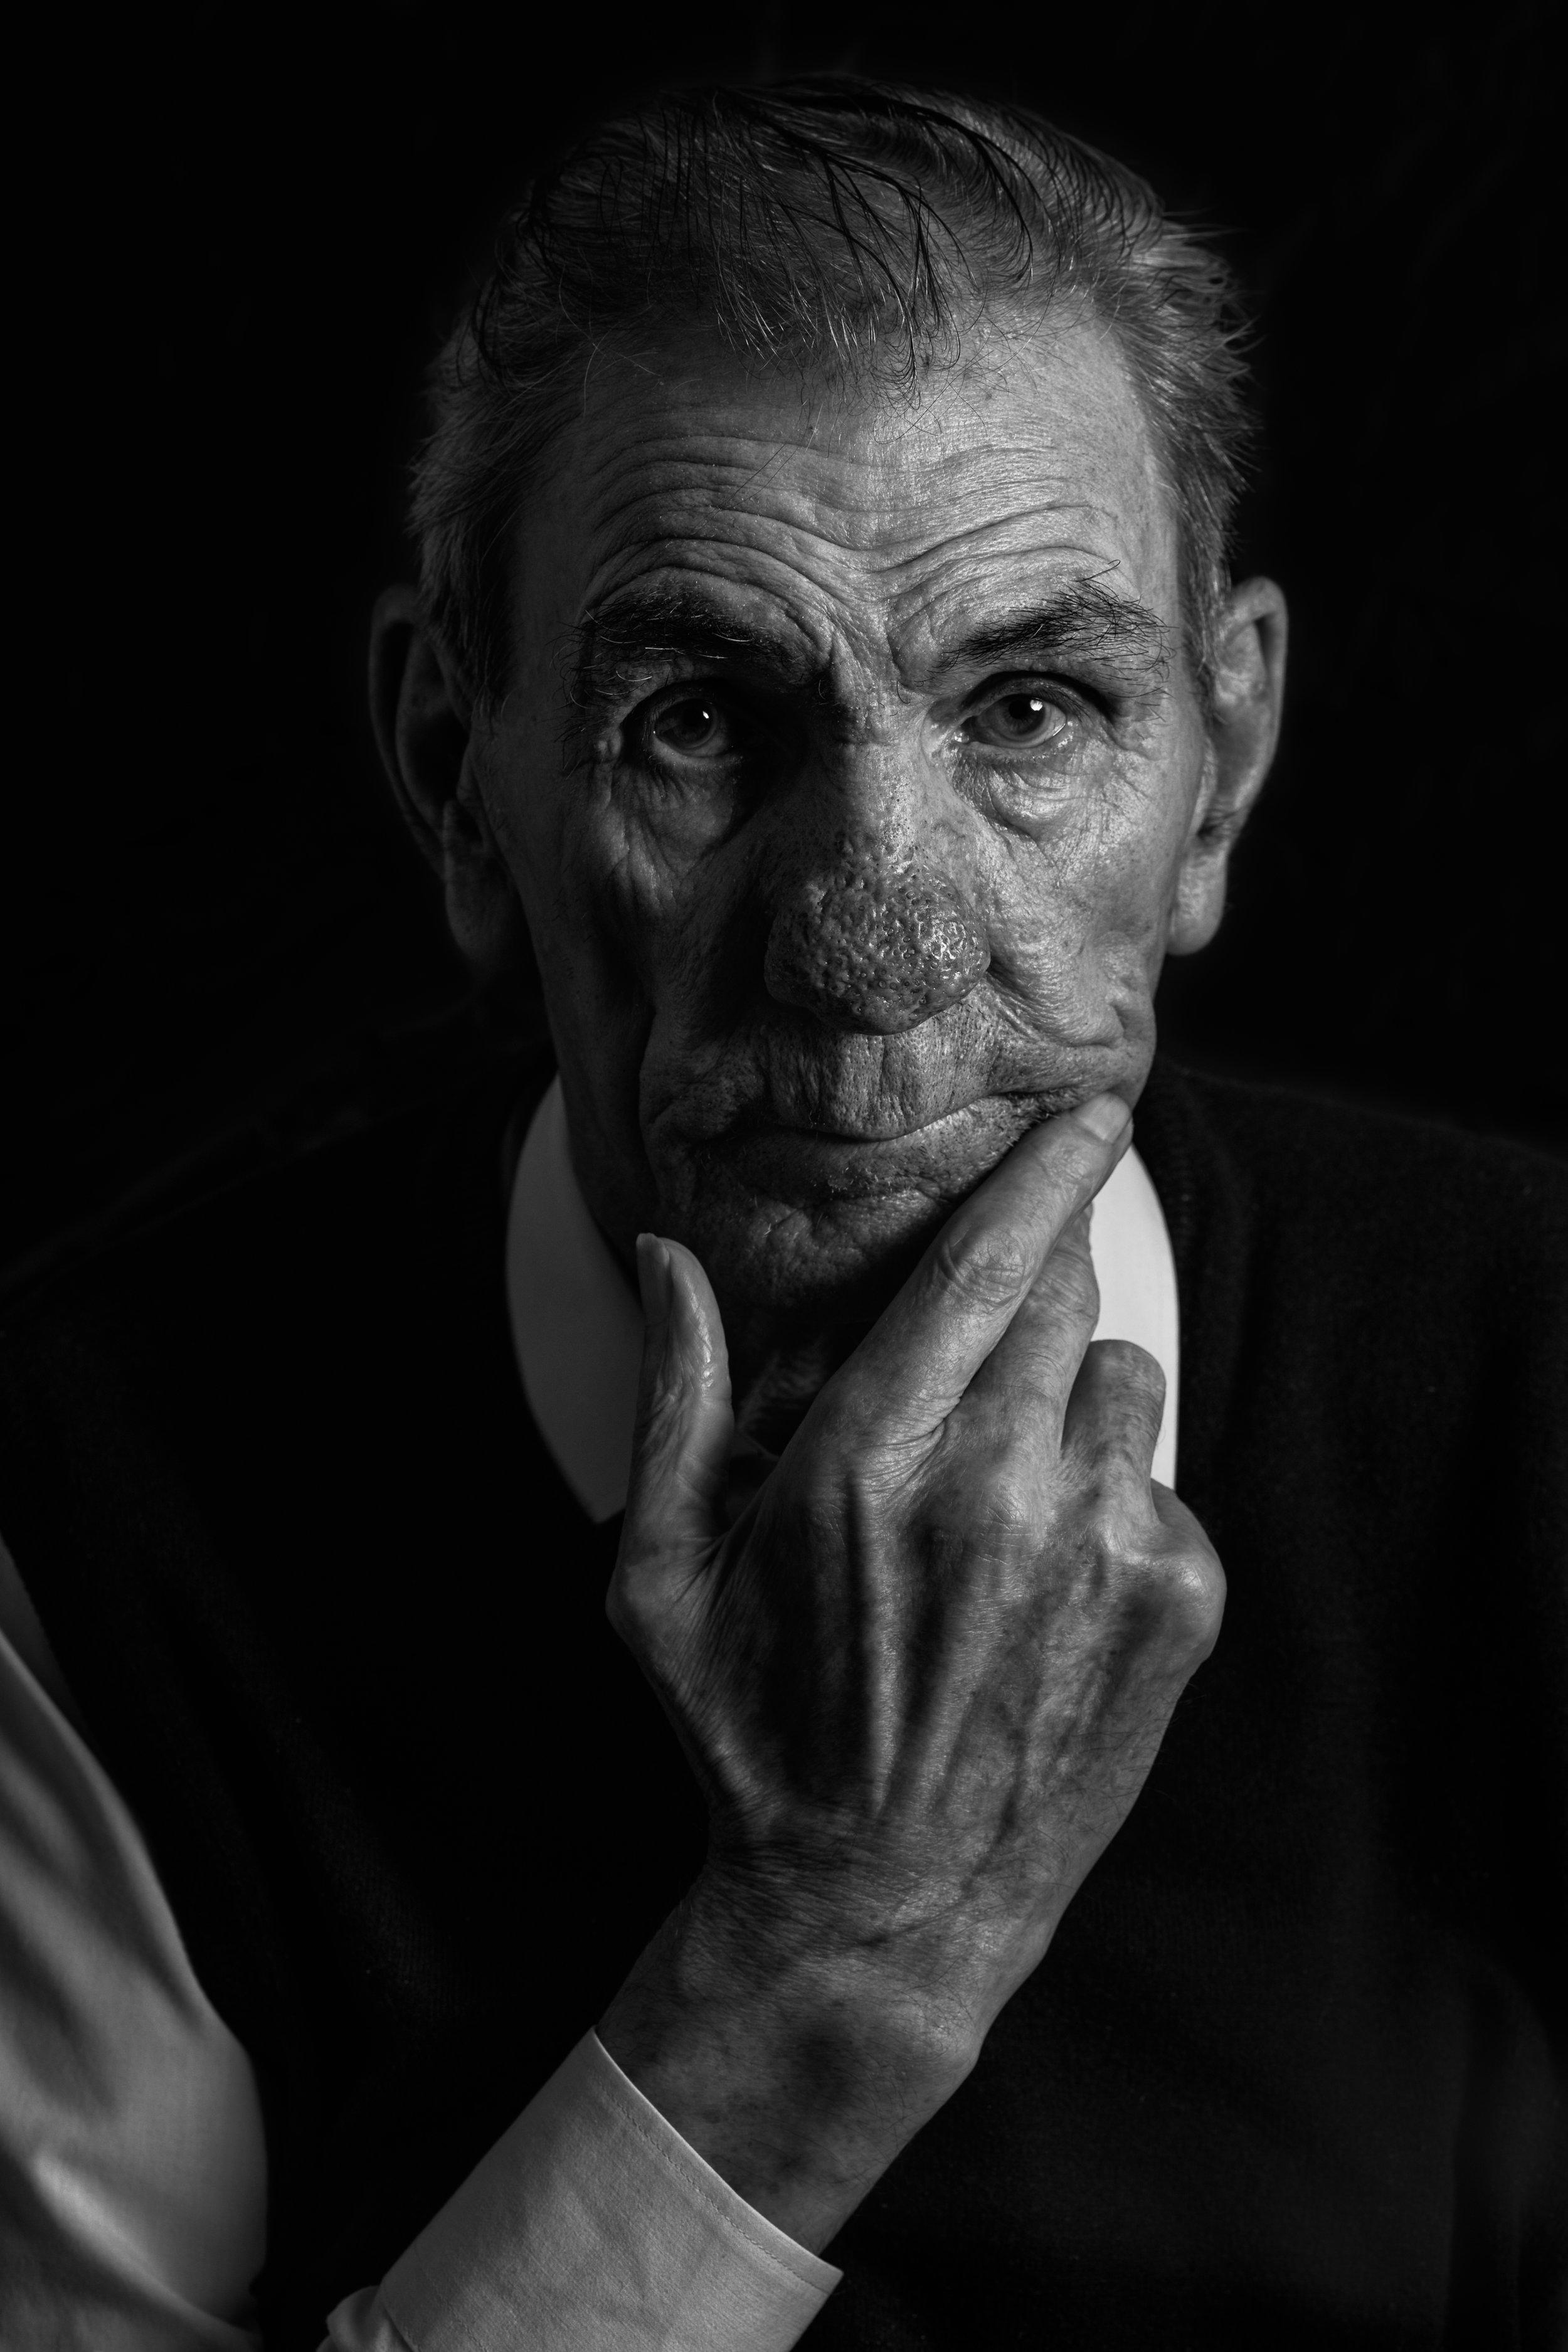 Buff_Elder_Portrait_Headshot_Ayrshire_Scott_Cameron_Wanstall